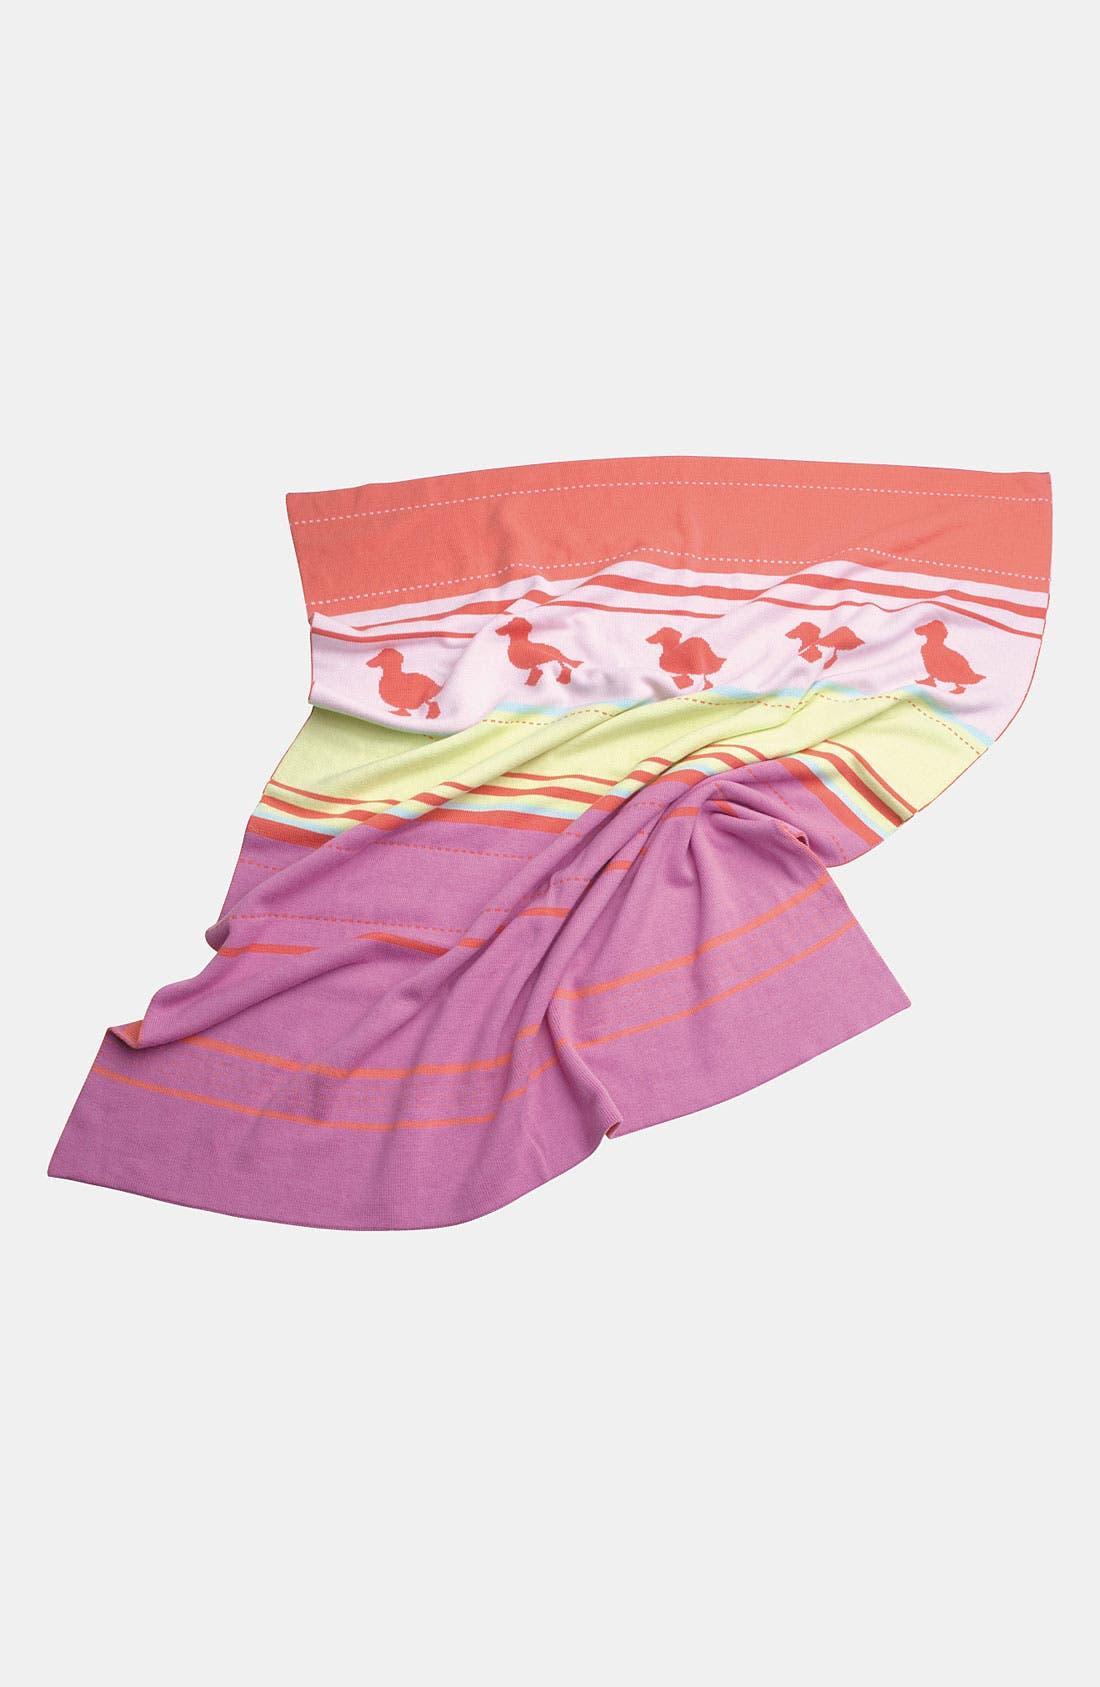 Alternate Image 2  - weegoamigo 'Five Little Ducks' Blanket